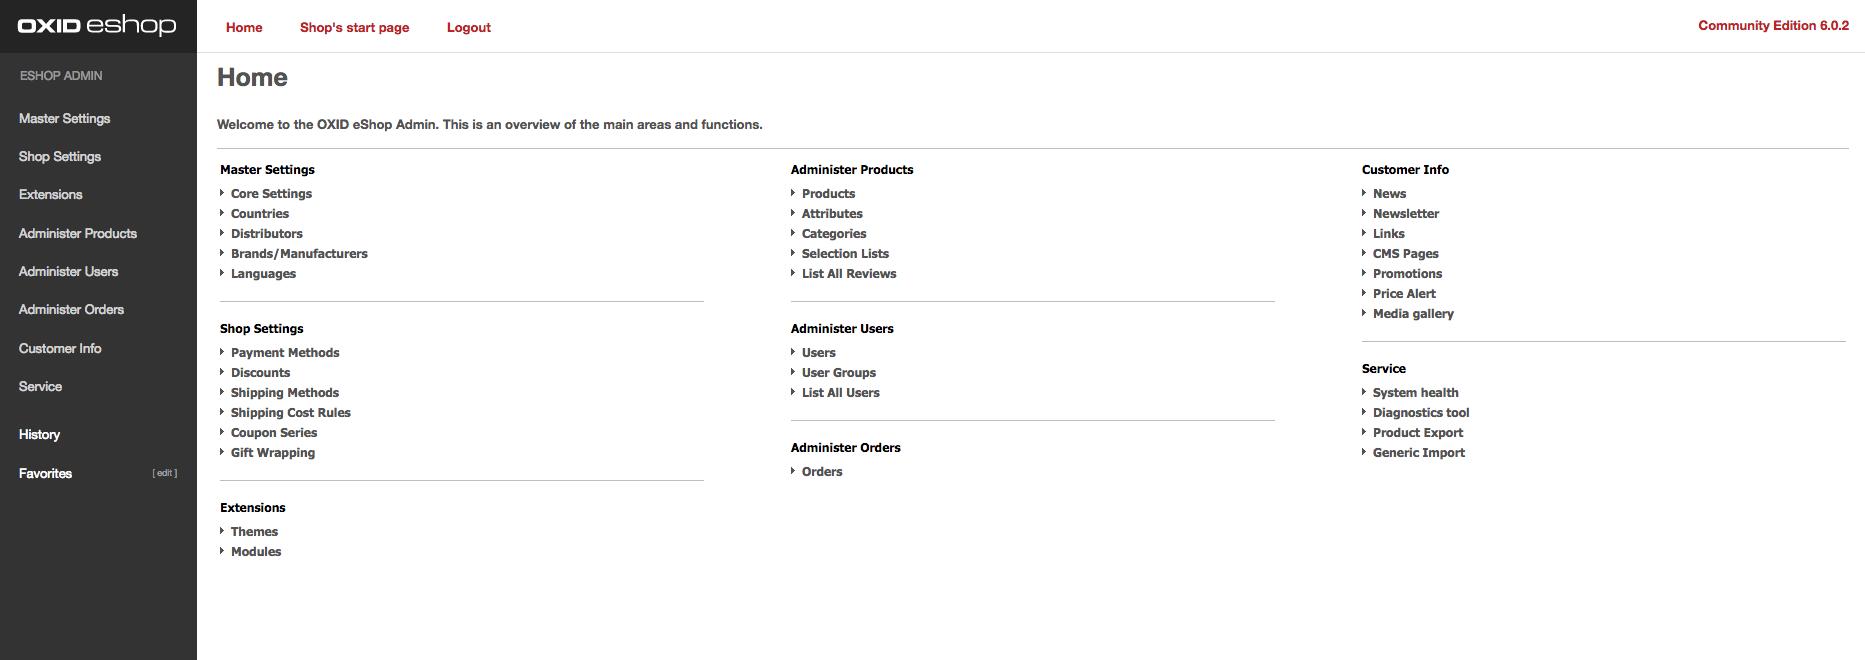 OXID eShop Admin Demo - Dashboard